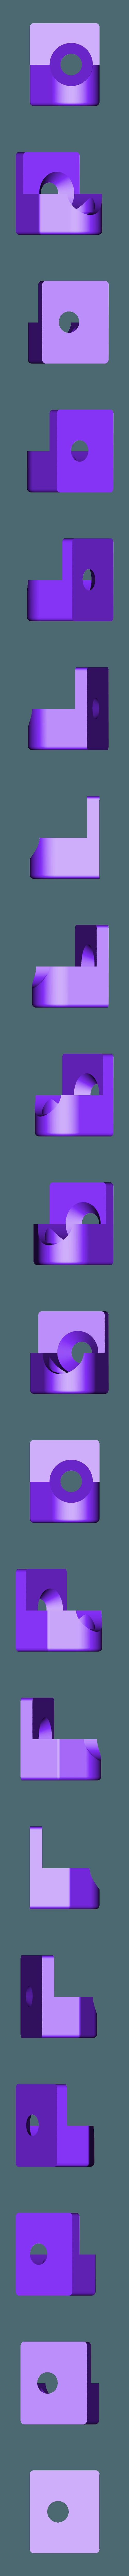 2020_Hinge_135_degree_v1-2.STL Download free STL file 2020 Hinge Corner • 3D printable design, WalterHsiao